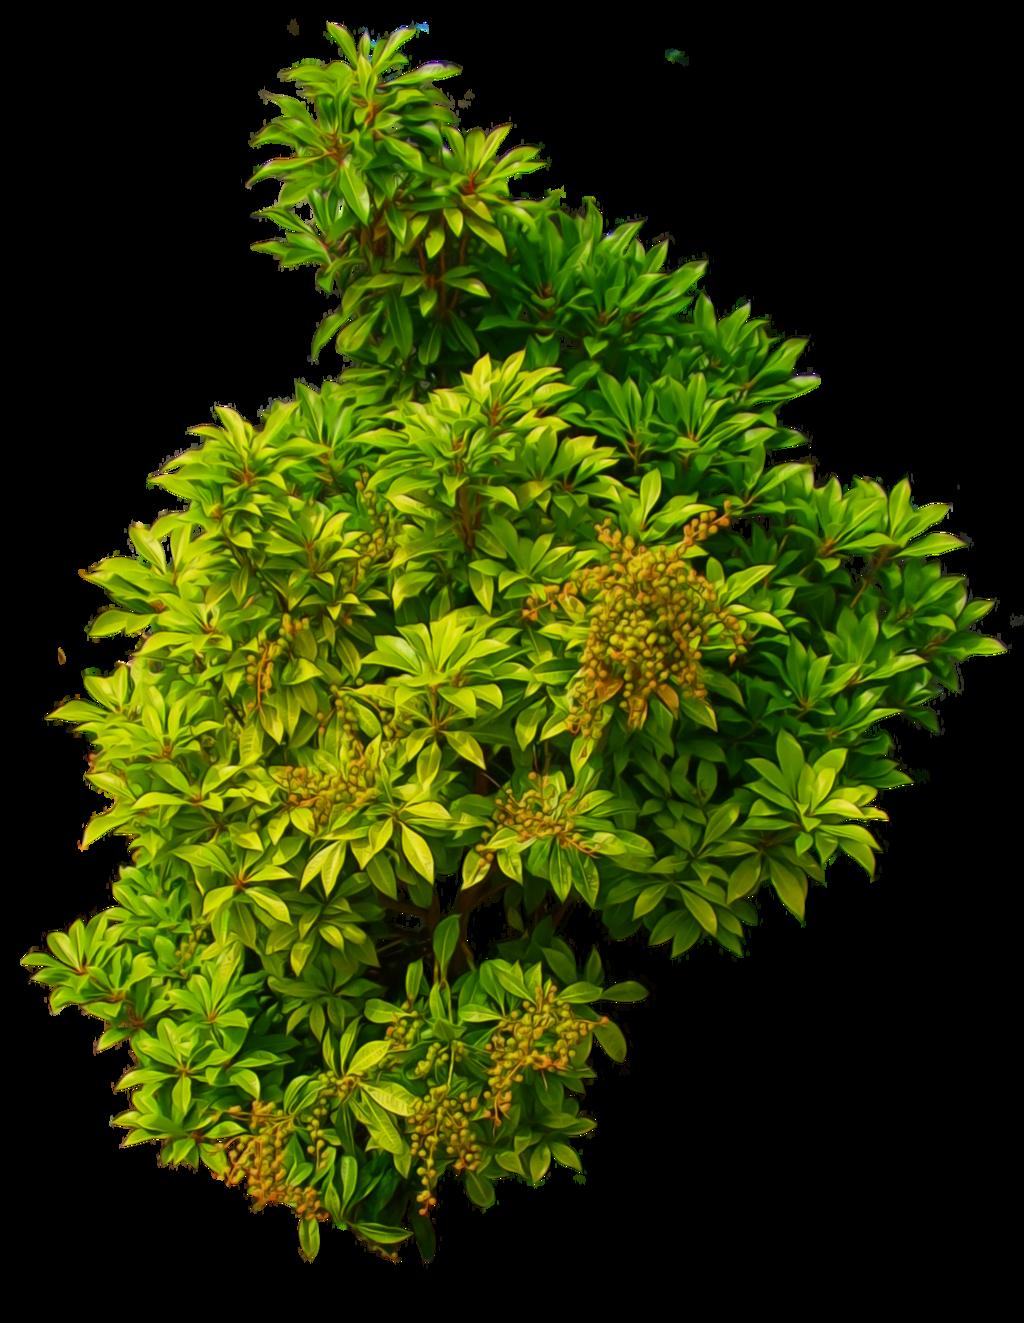 Bush PNG image - Bush PNG